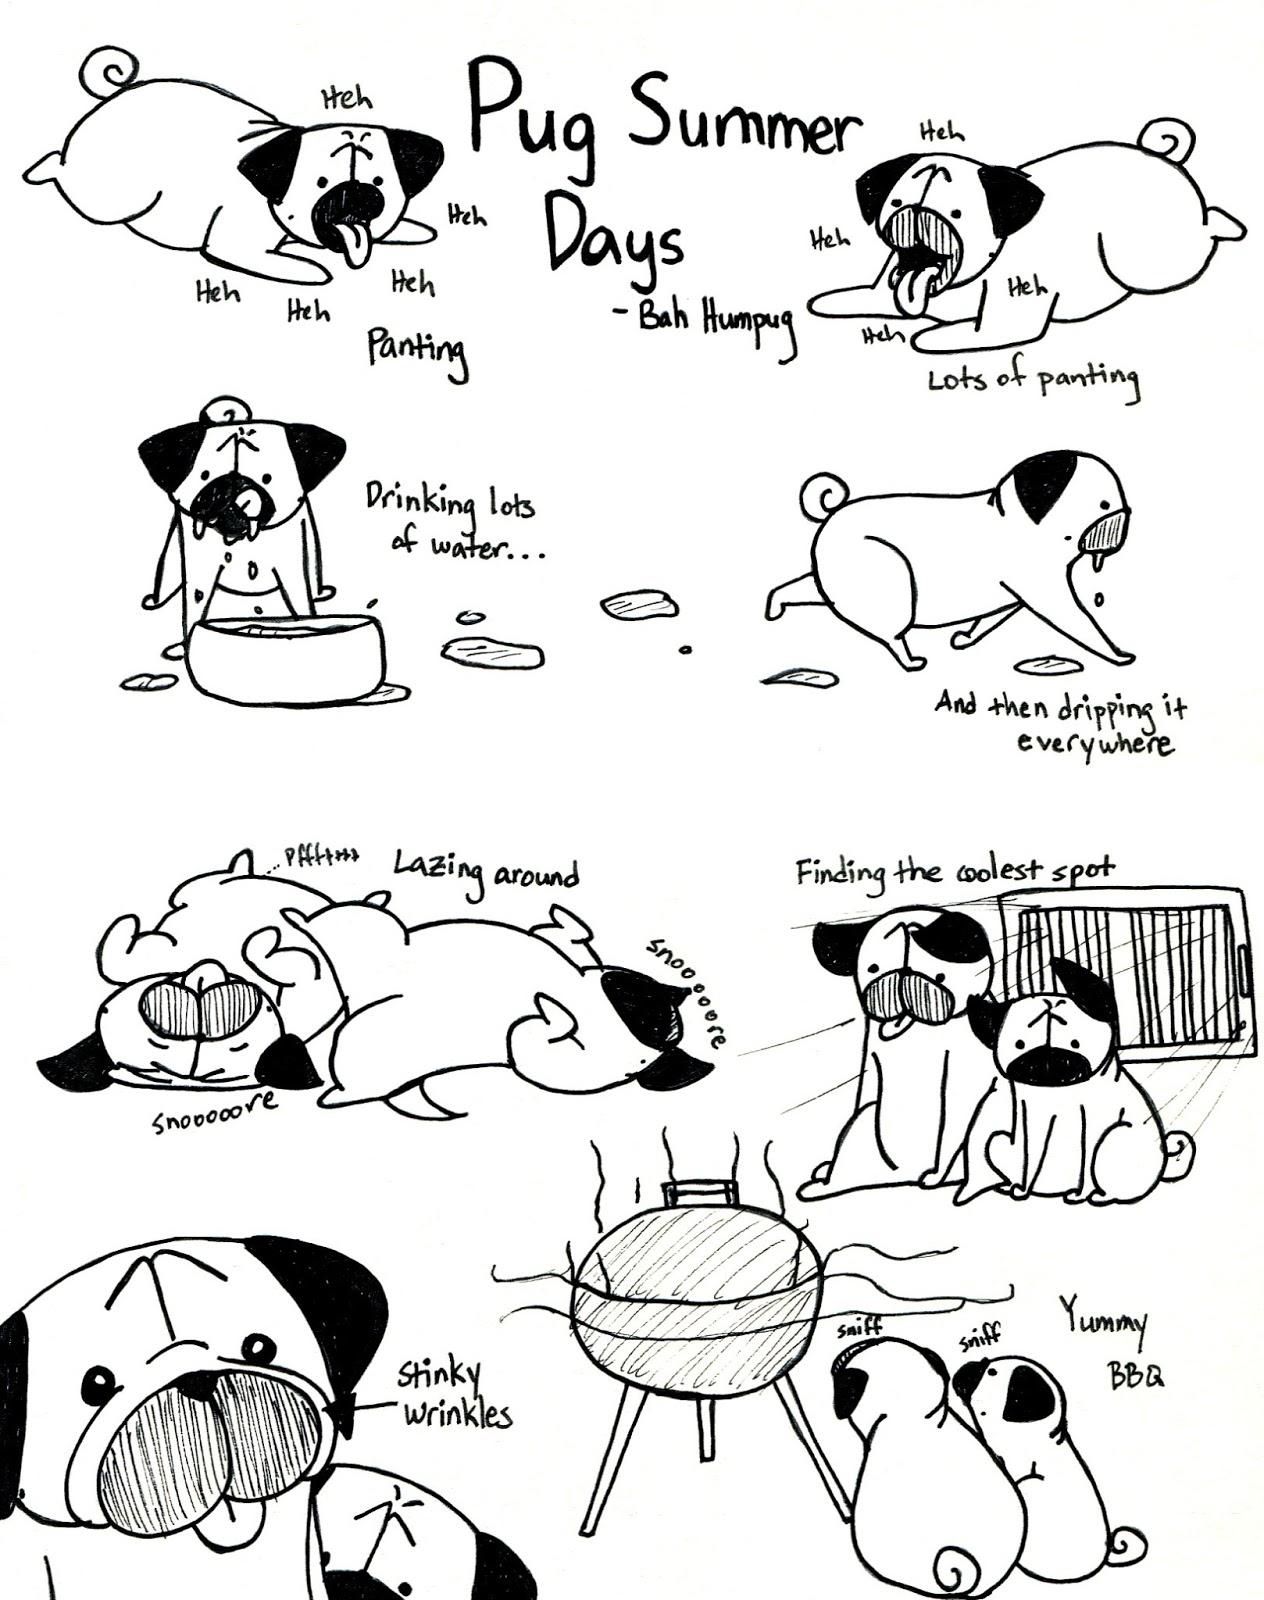 Drawn pug poo Humpug: Pug Days 2013 Summer